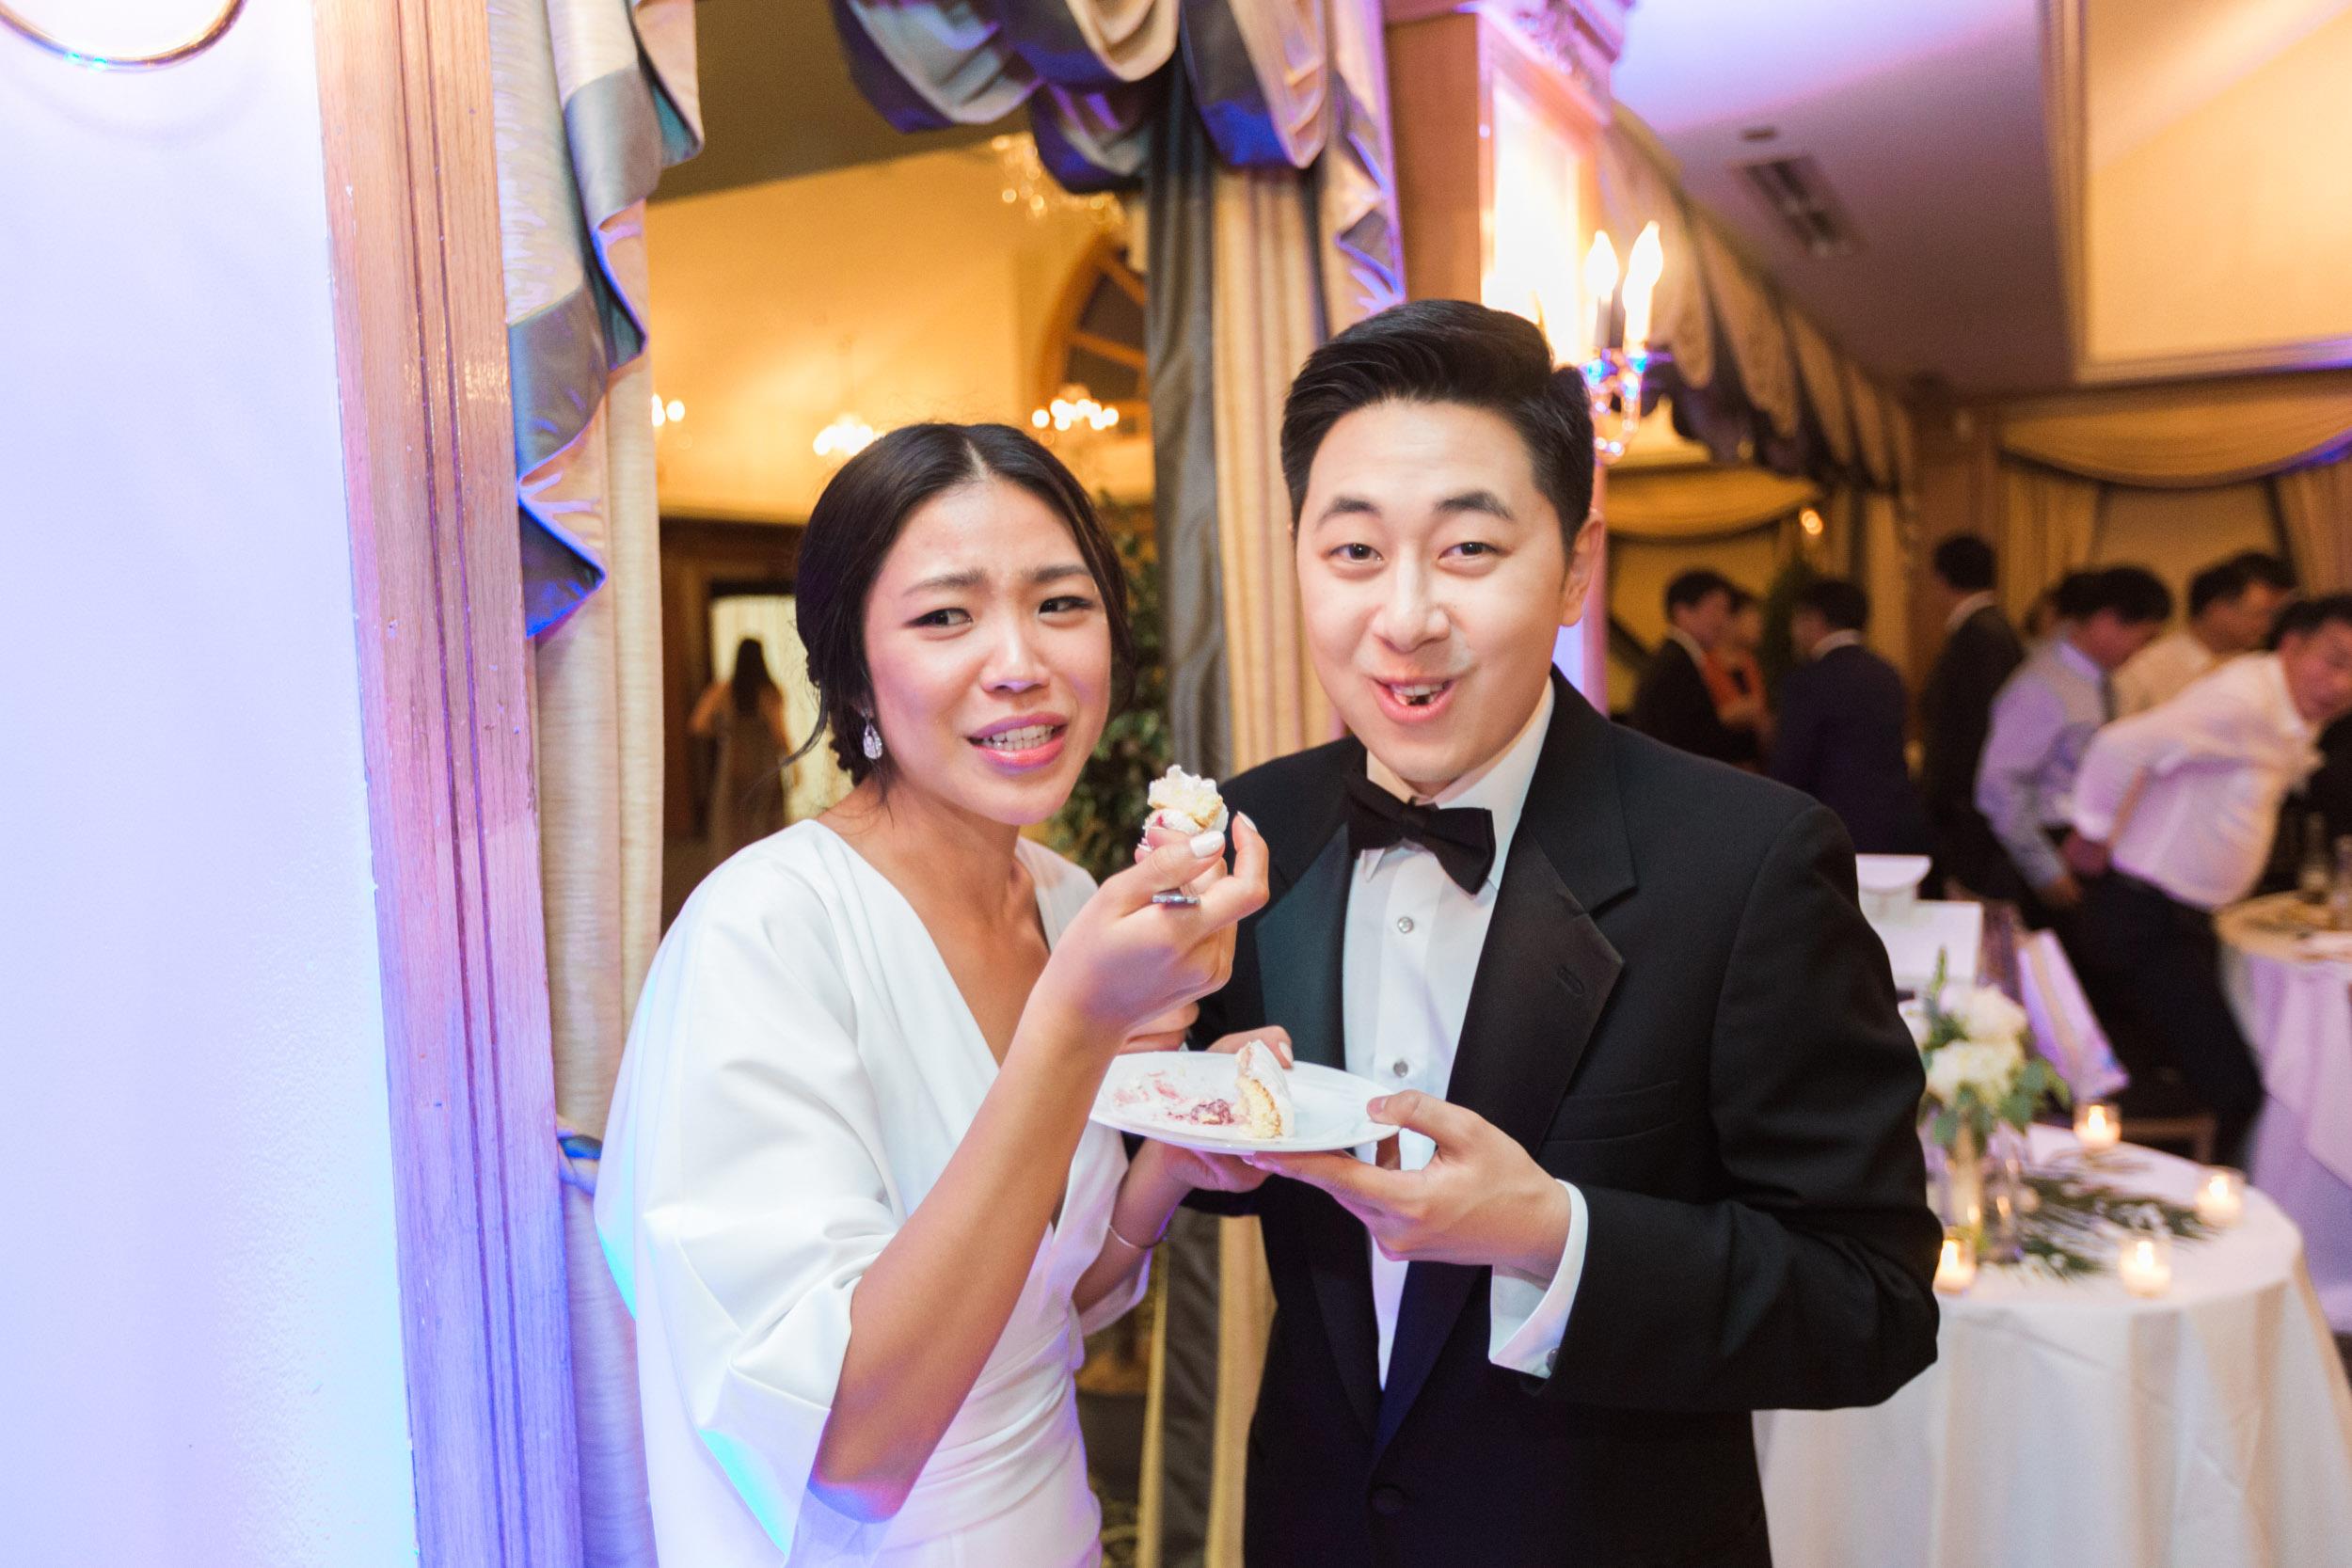 jean-arnold-wedding-0057.jpg